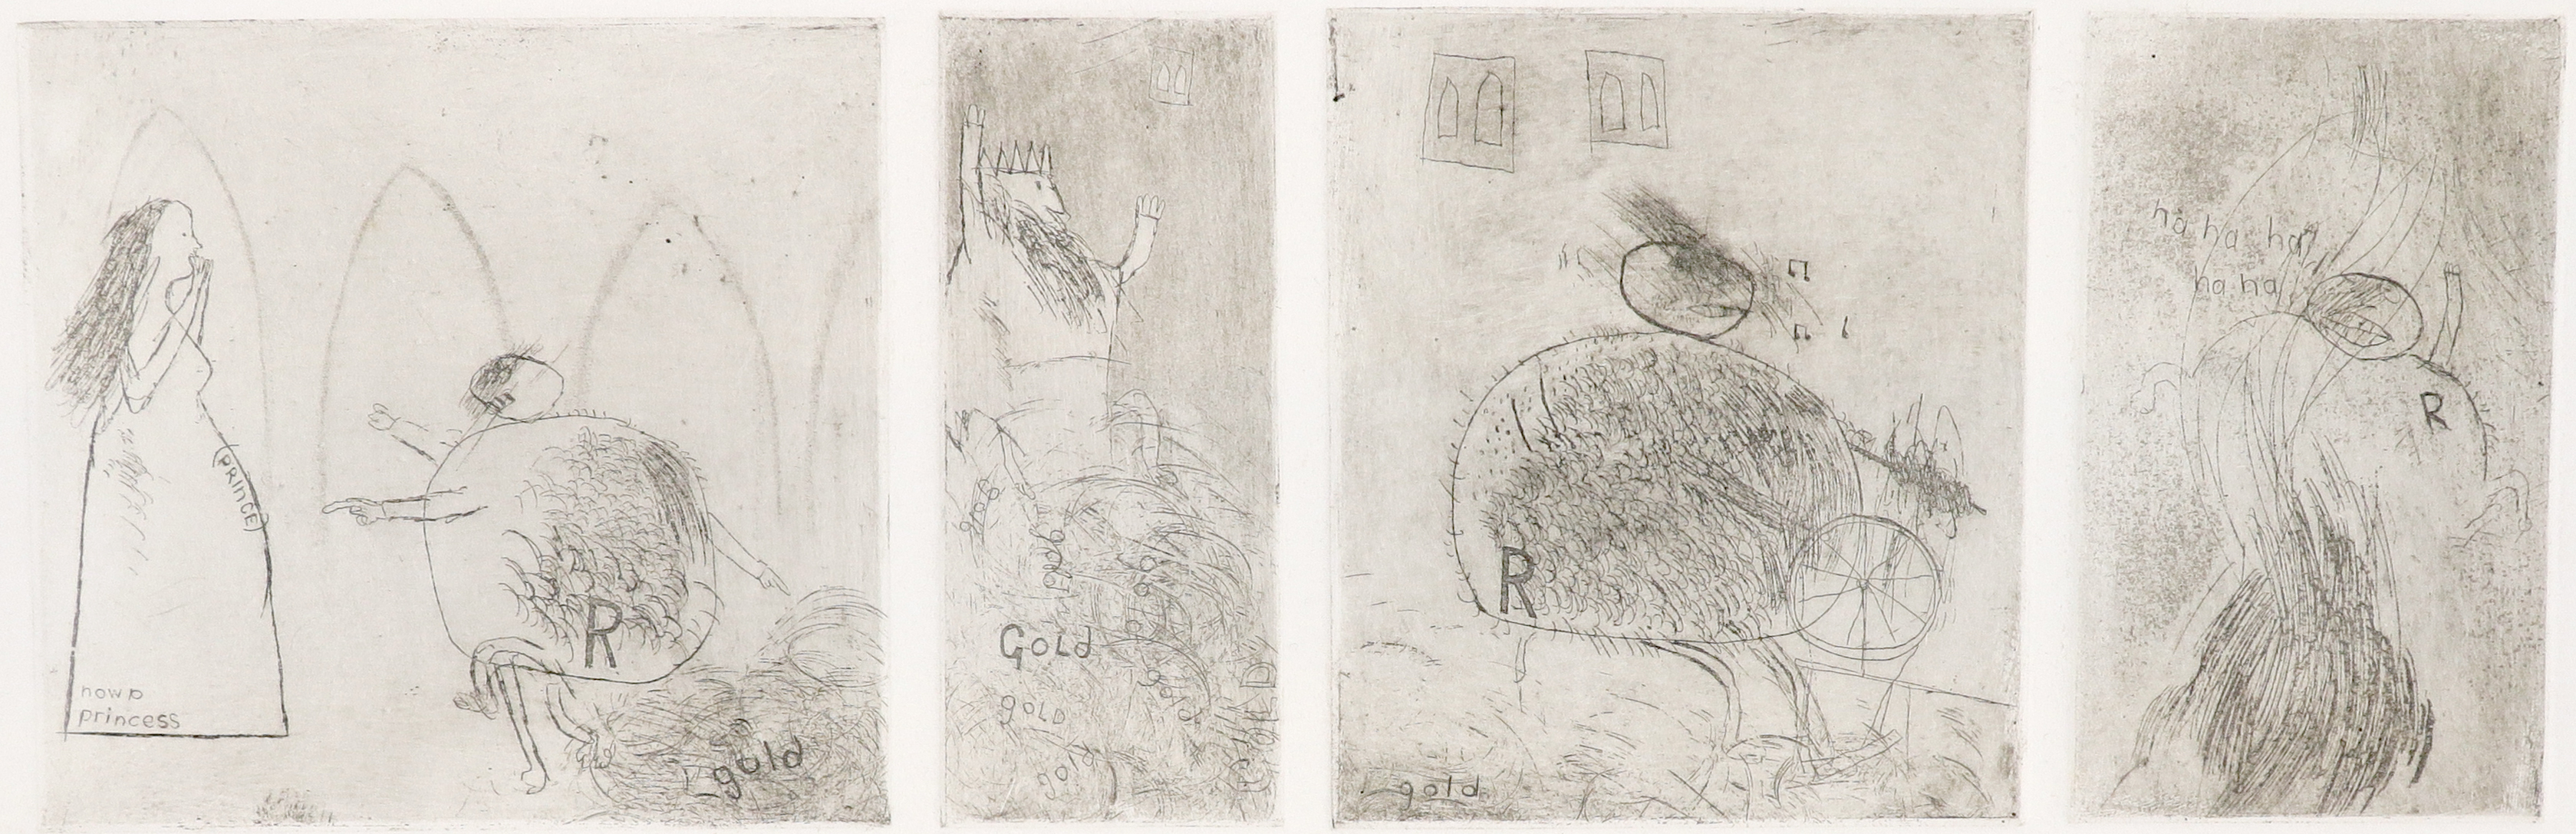 ‡David Hockney, OM, CH, RA (b.1937) Study for Rumpelstiltskin Four etchings on one sheet, trial